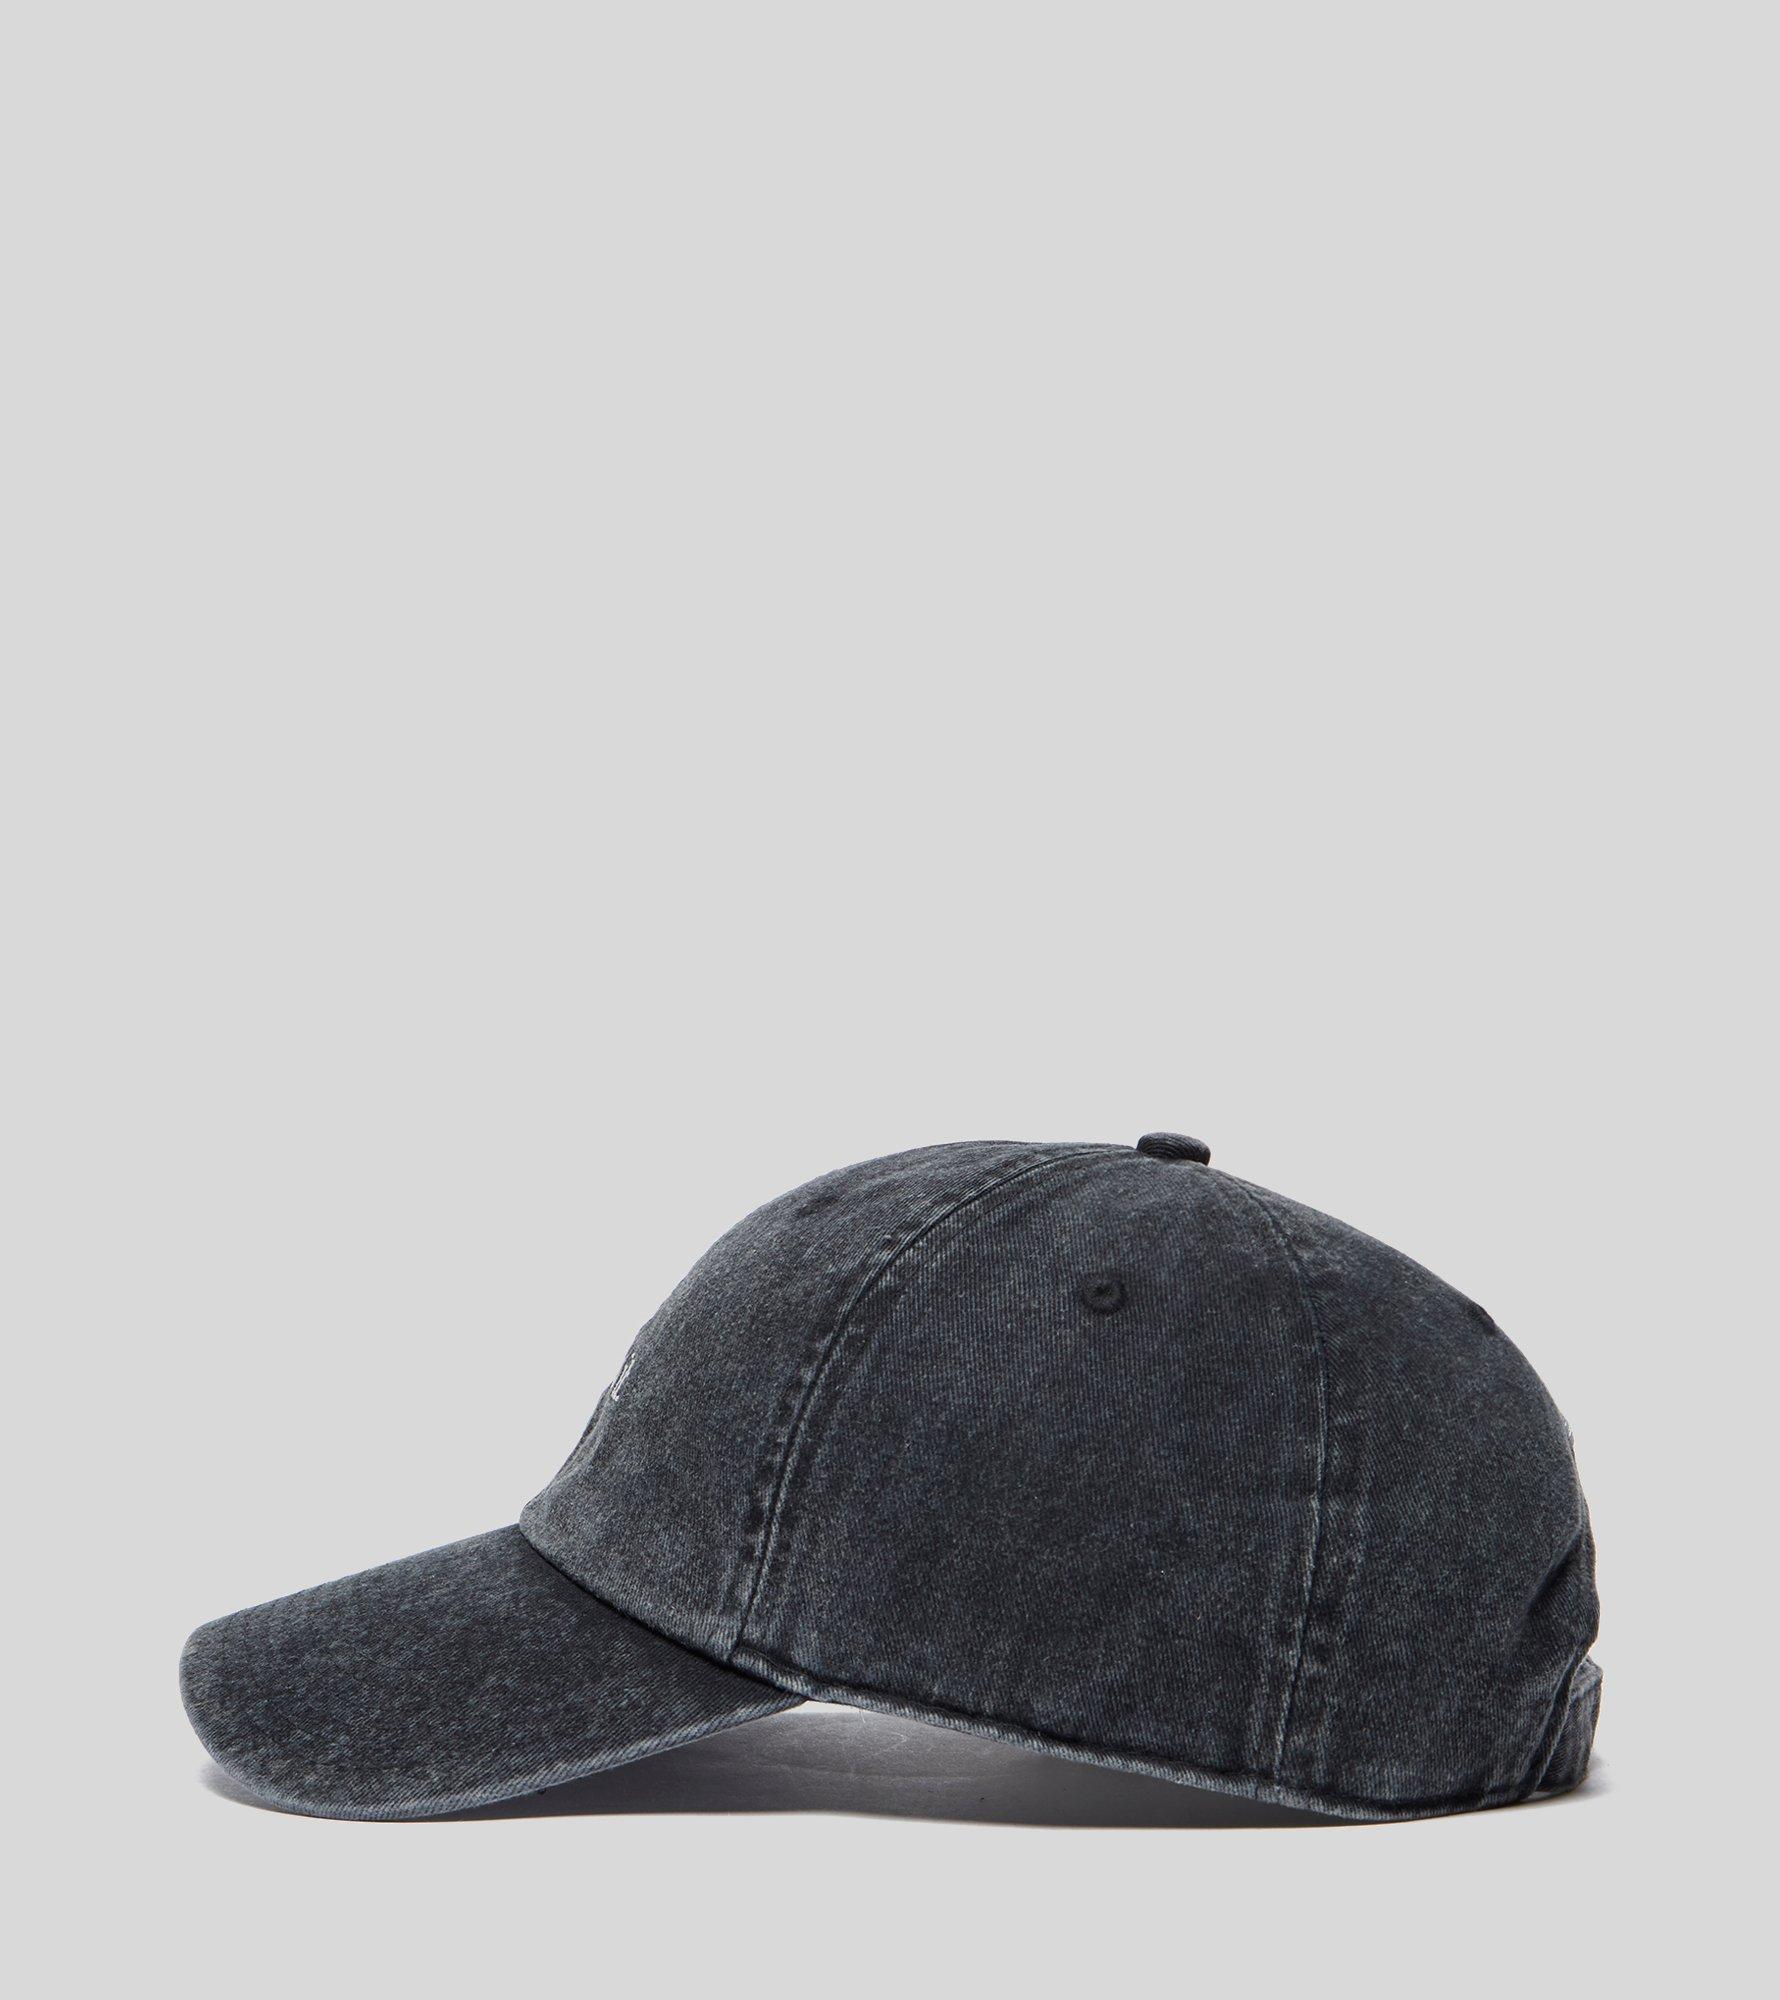 bdb0a6f1fda Nike Just Do It Cap in Black - Lyst